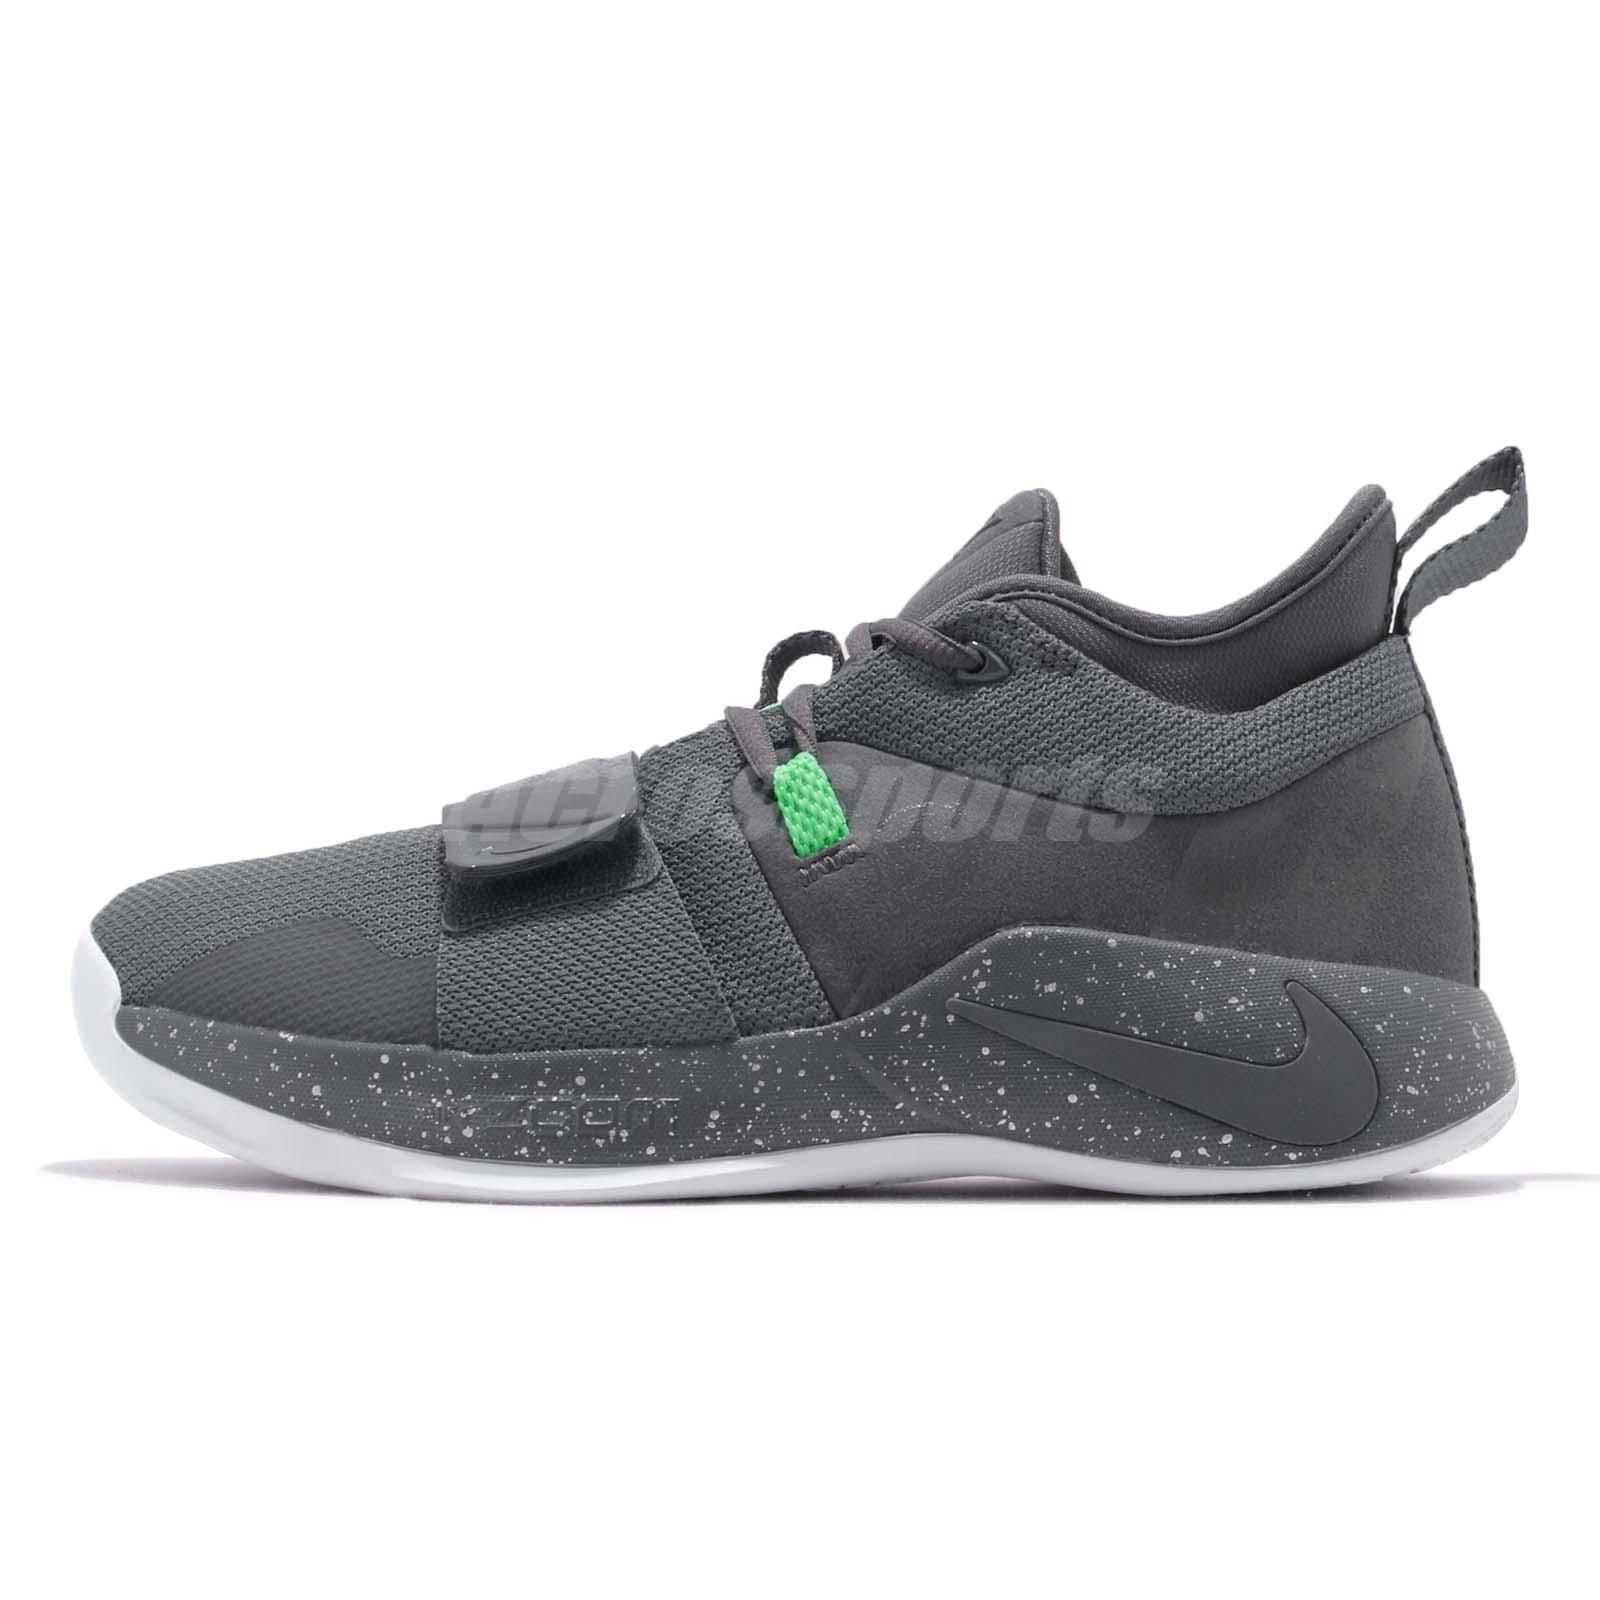 Nike PG 2.5 EP Paul George Grey Green White Men Basketball Shoes BQ8453-007 77faed3bb